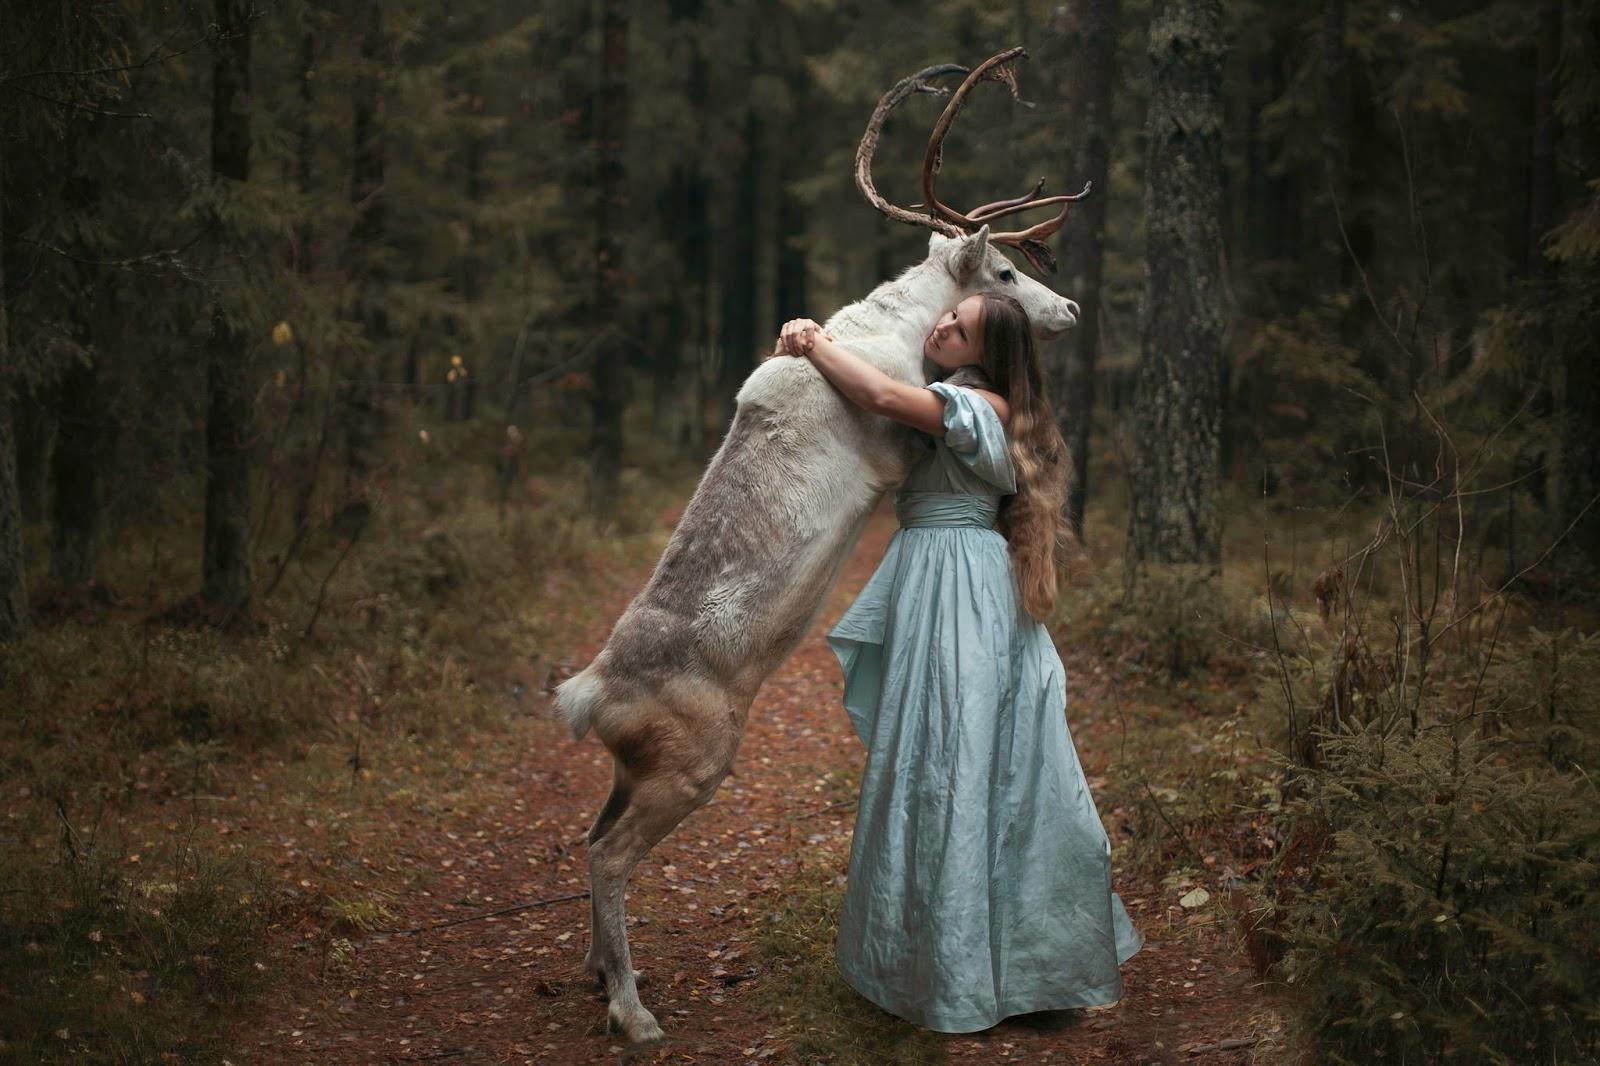 photo de Katerina Plotnikova jeune femme enlaçant un renne